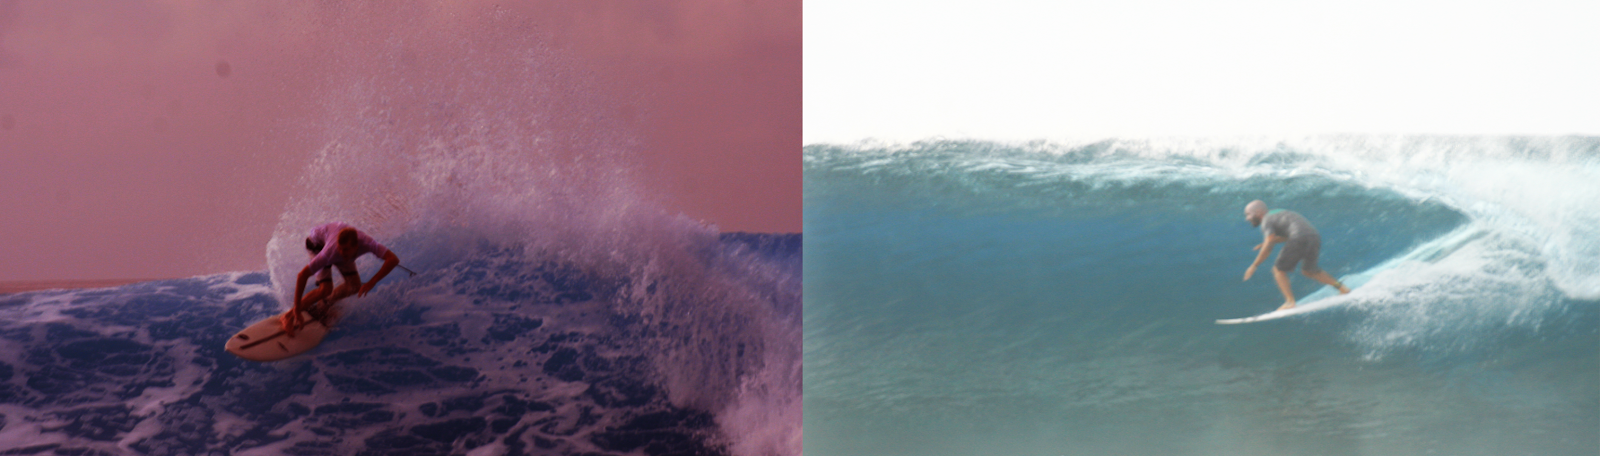 surfing republic